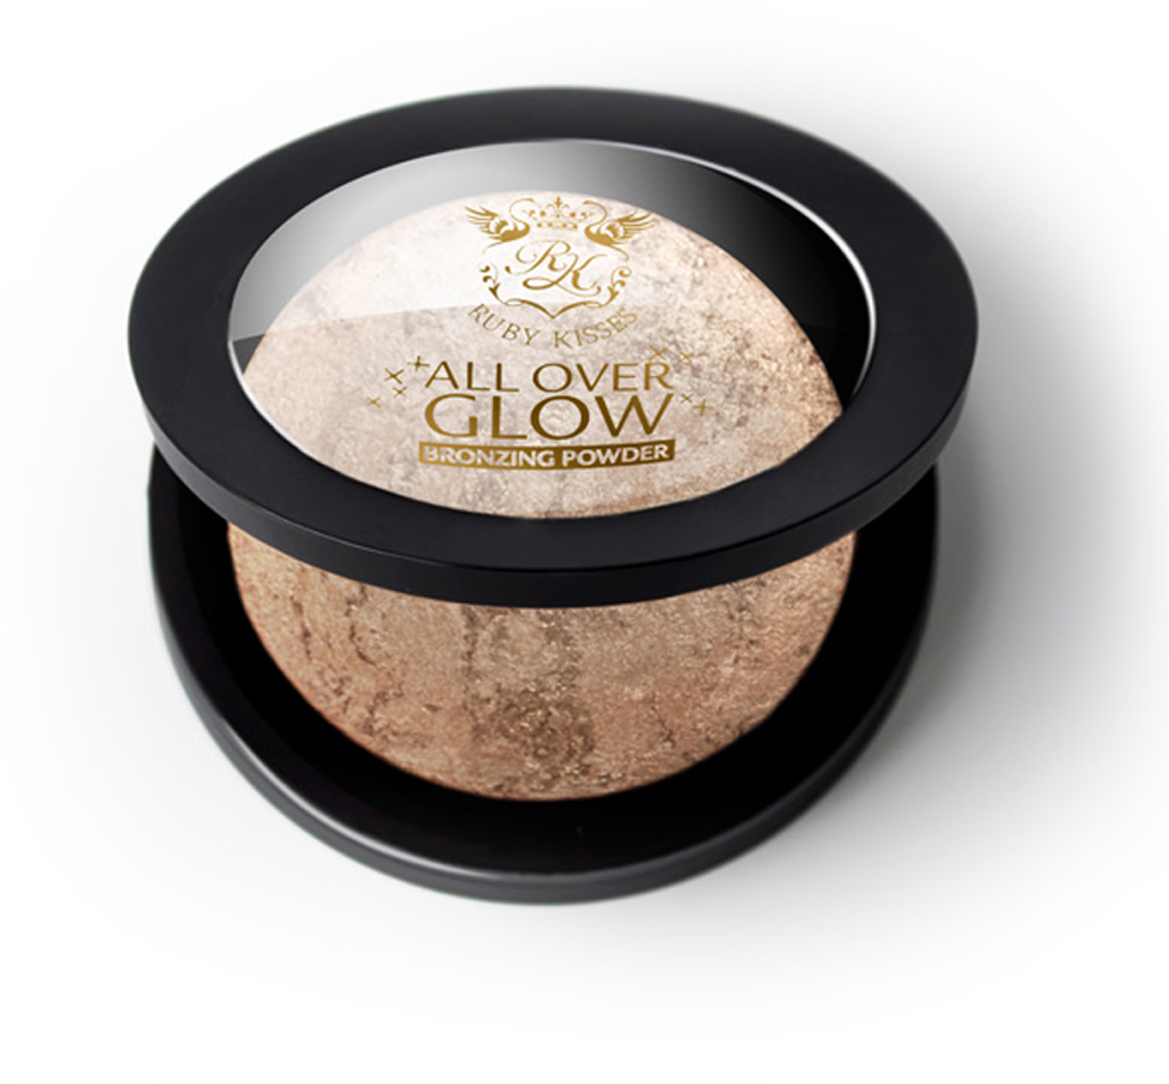 Kiss Бронзирующая пудра Light Glow Face & Body Bling Powder ABP01